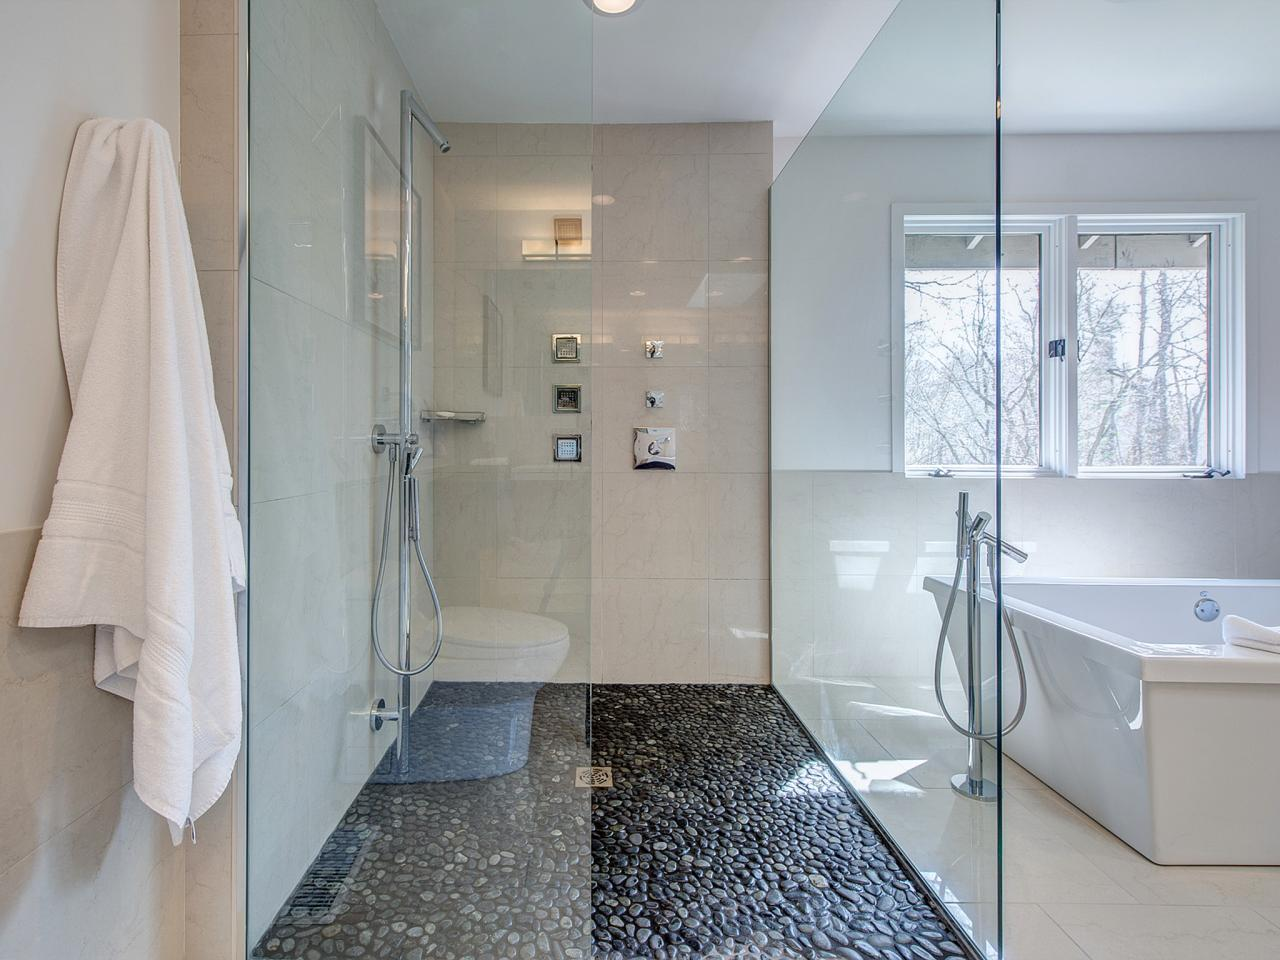 pebble-shower-pan.jpeg